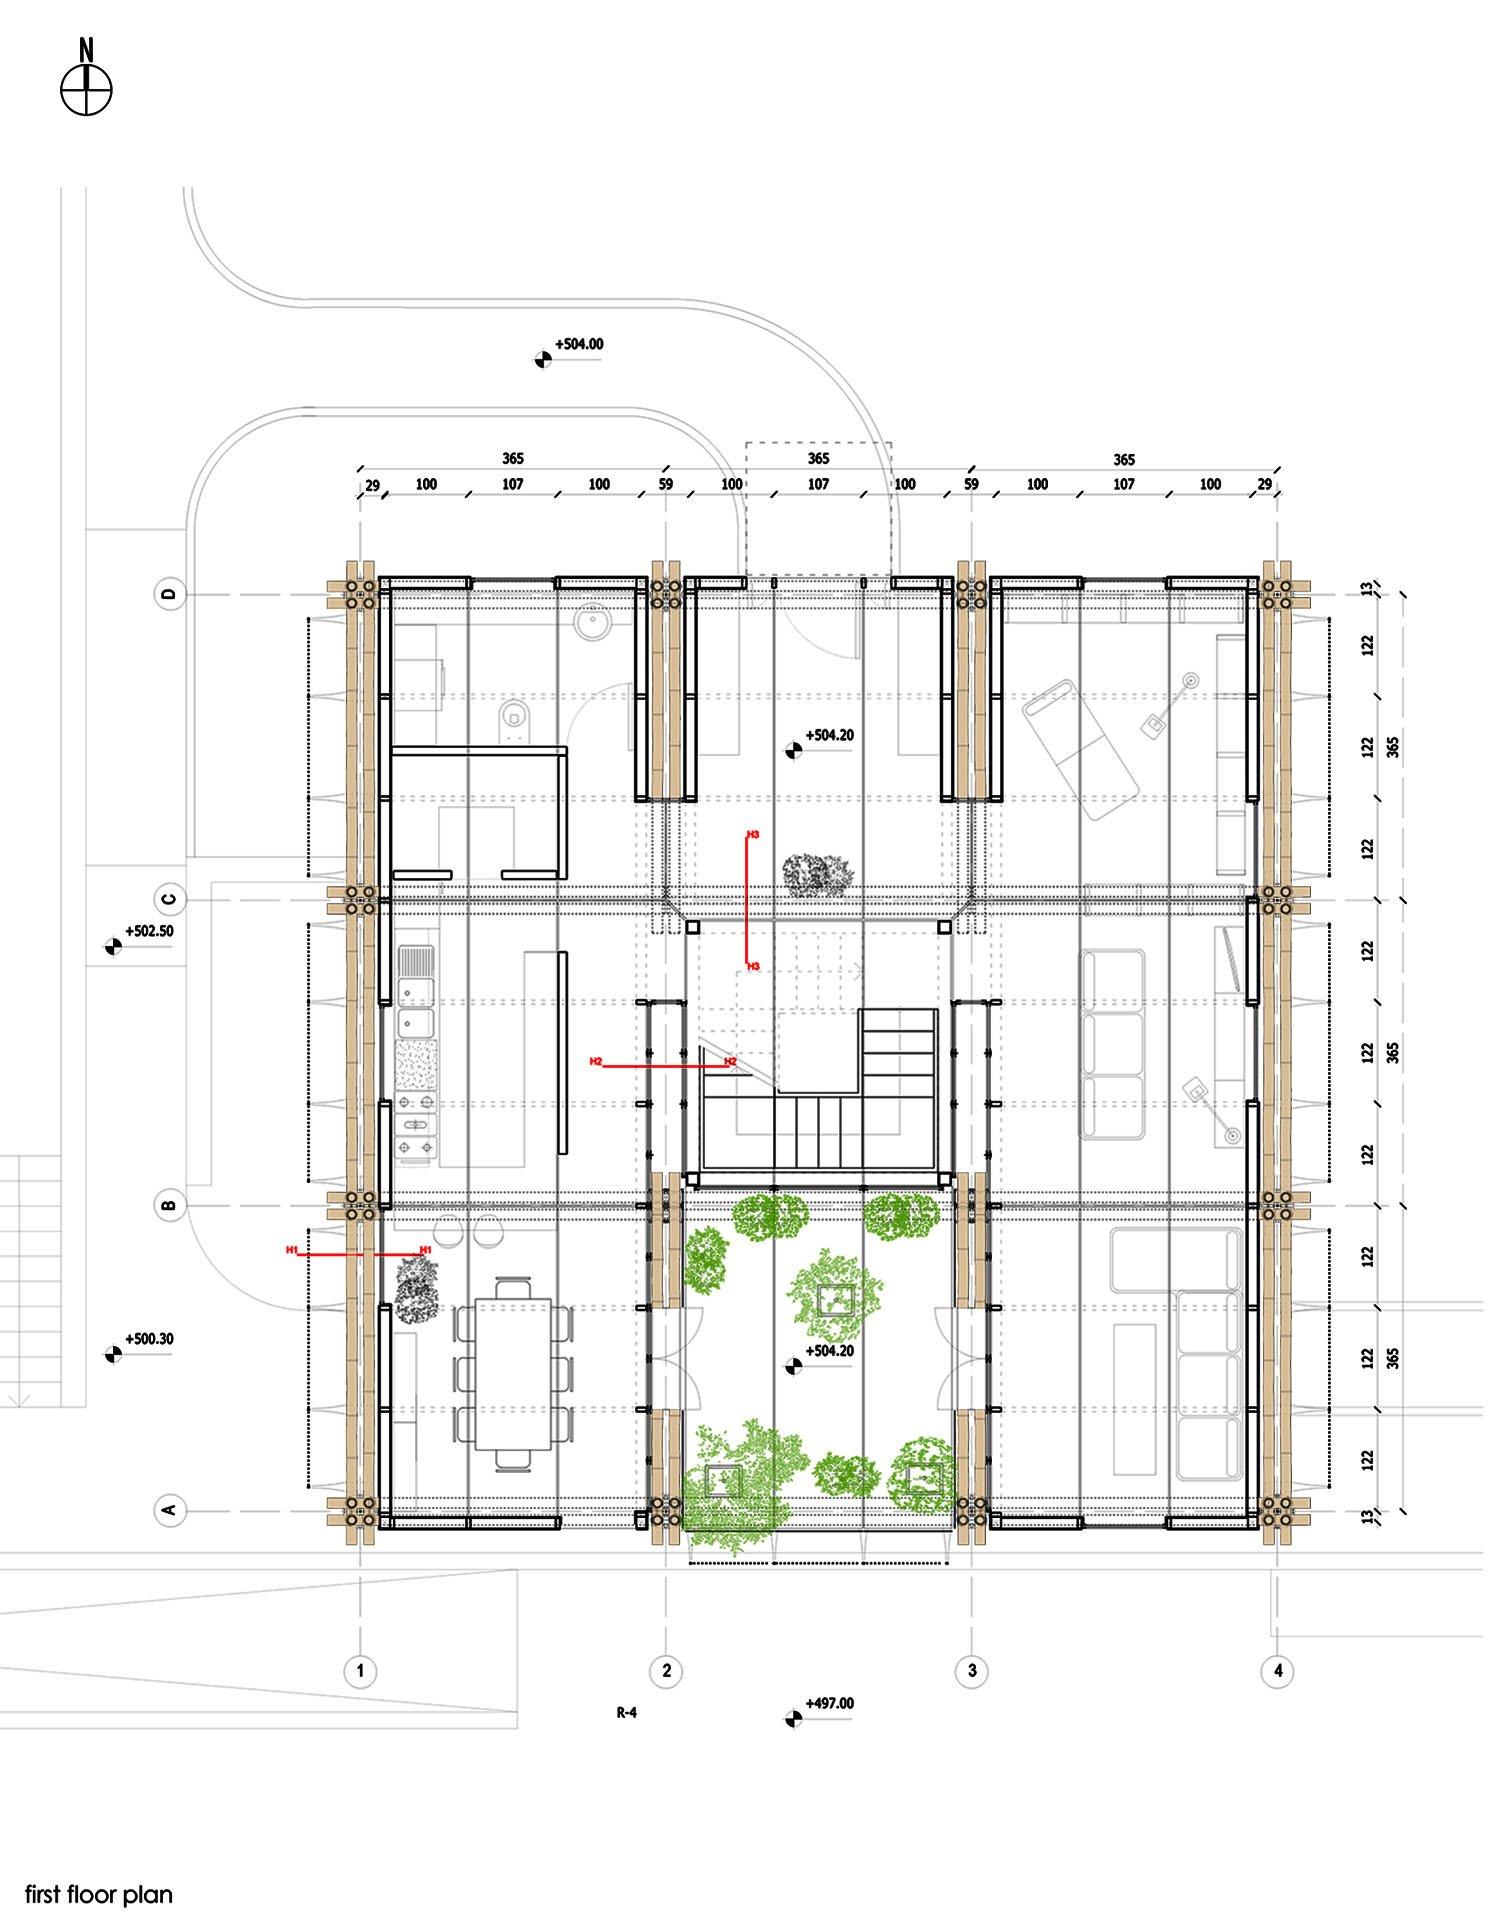 3. First floor plan }